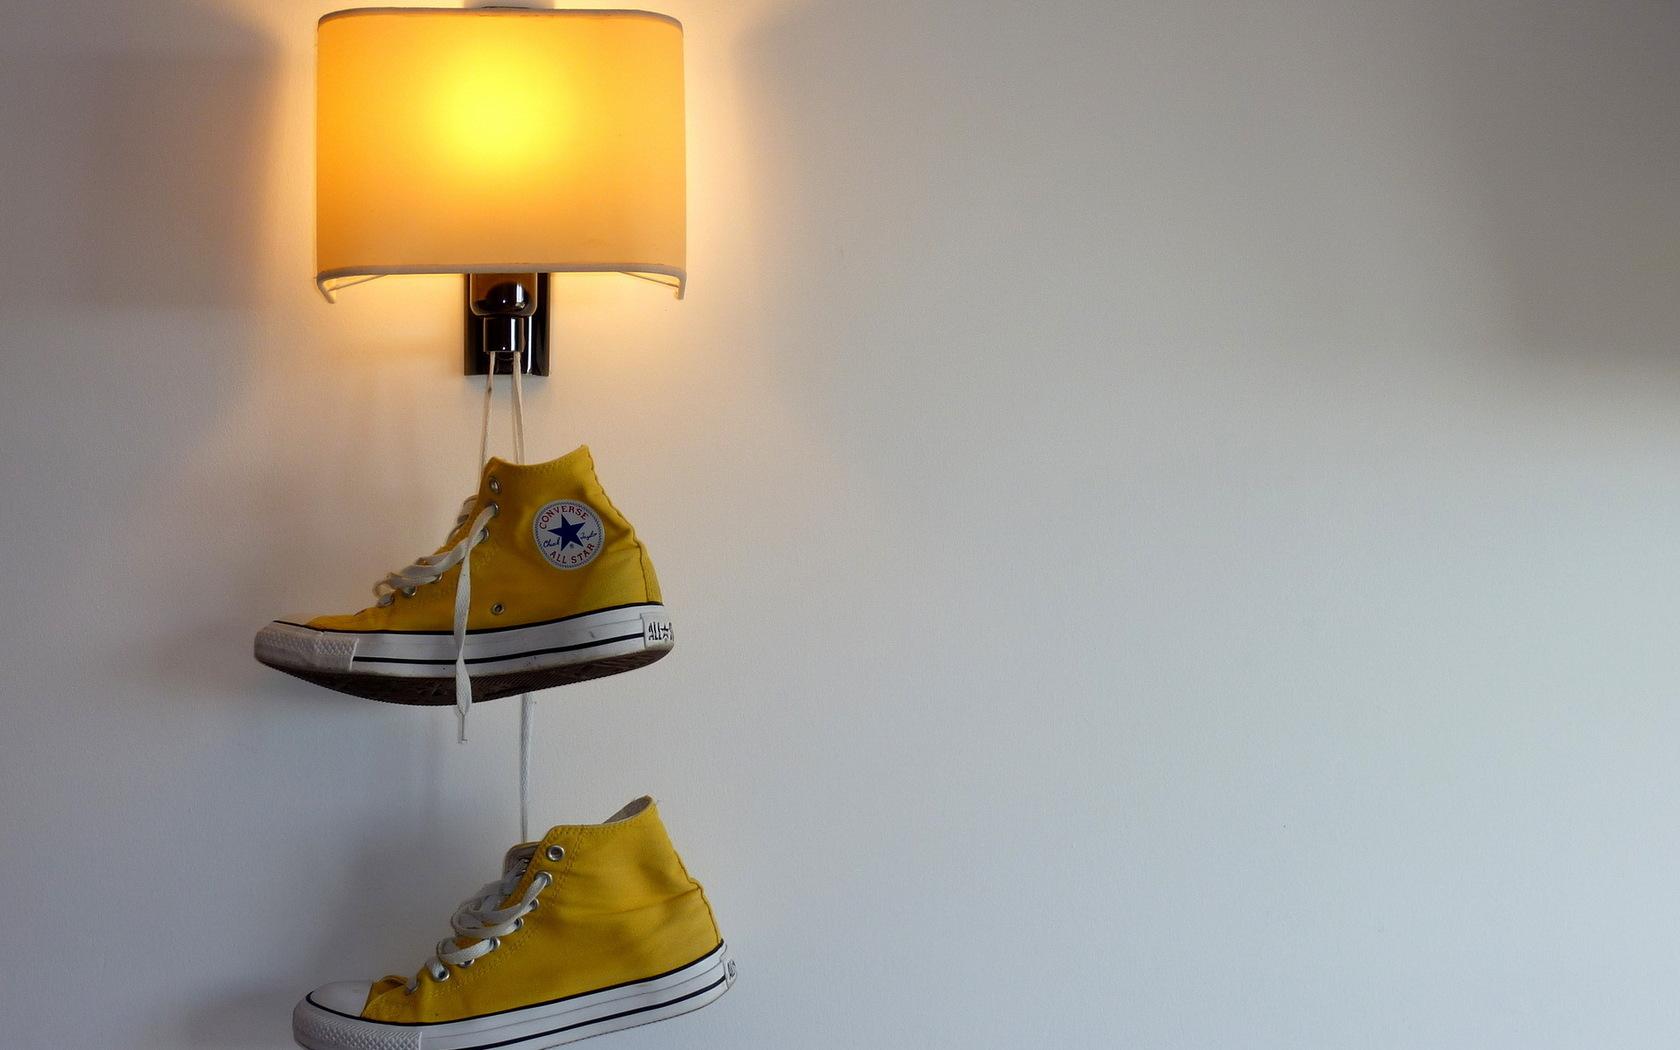 yellow converse computer wallpaper 60359